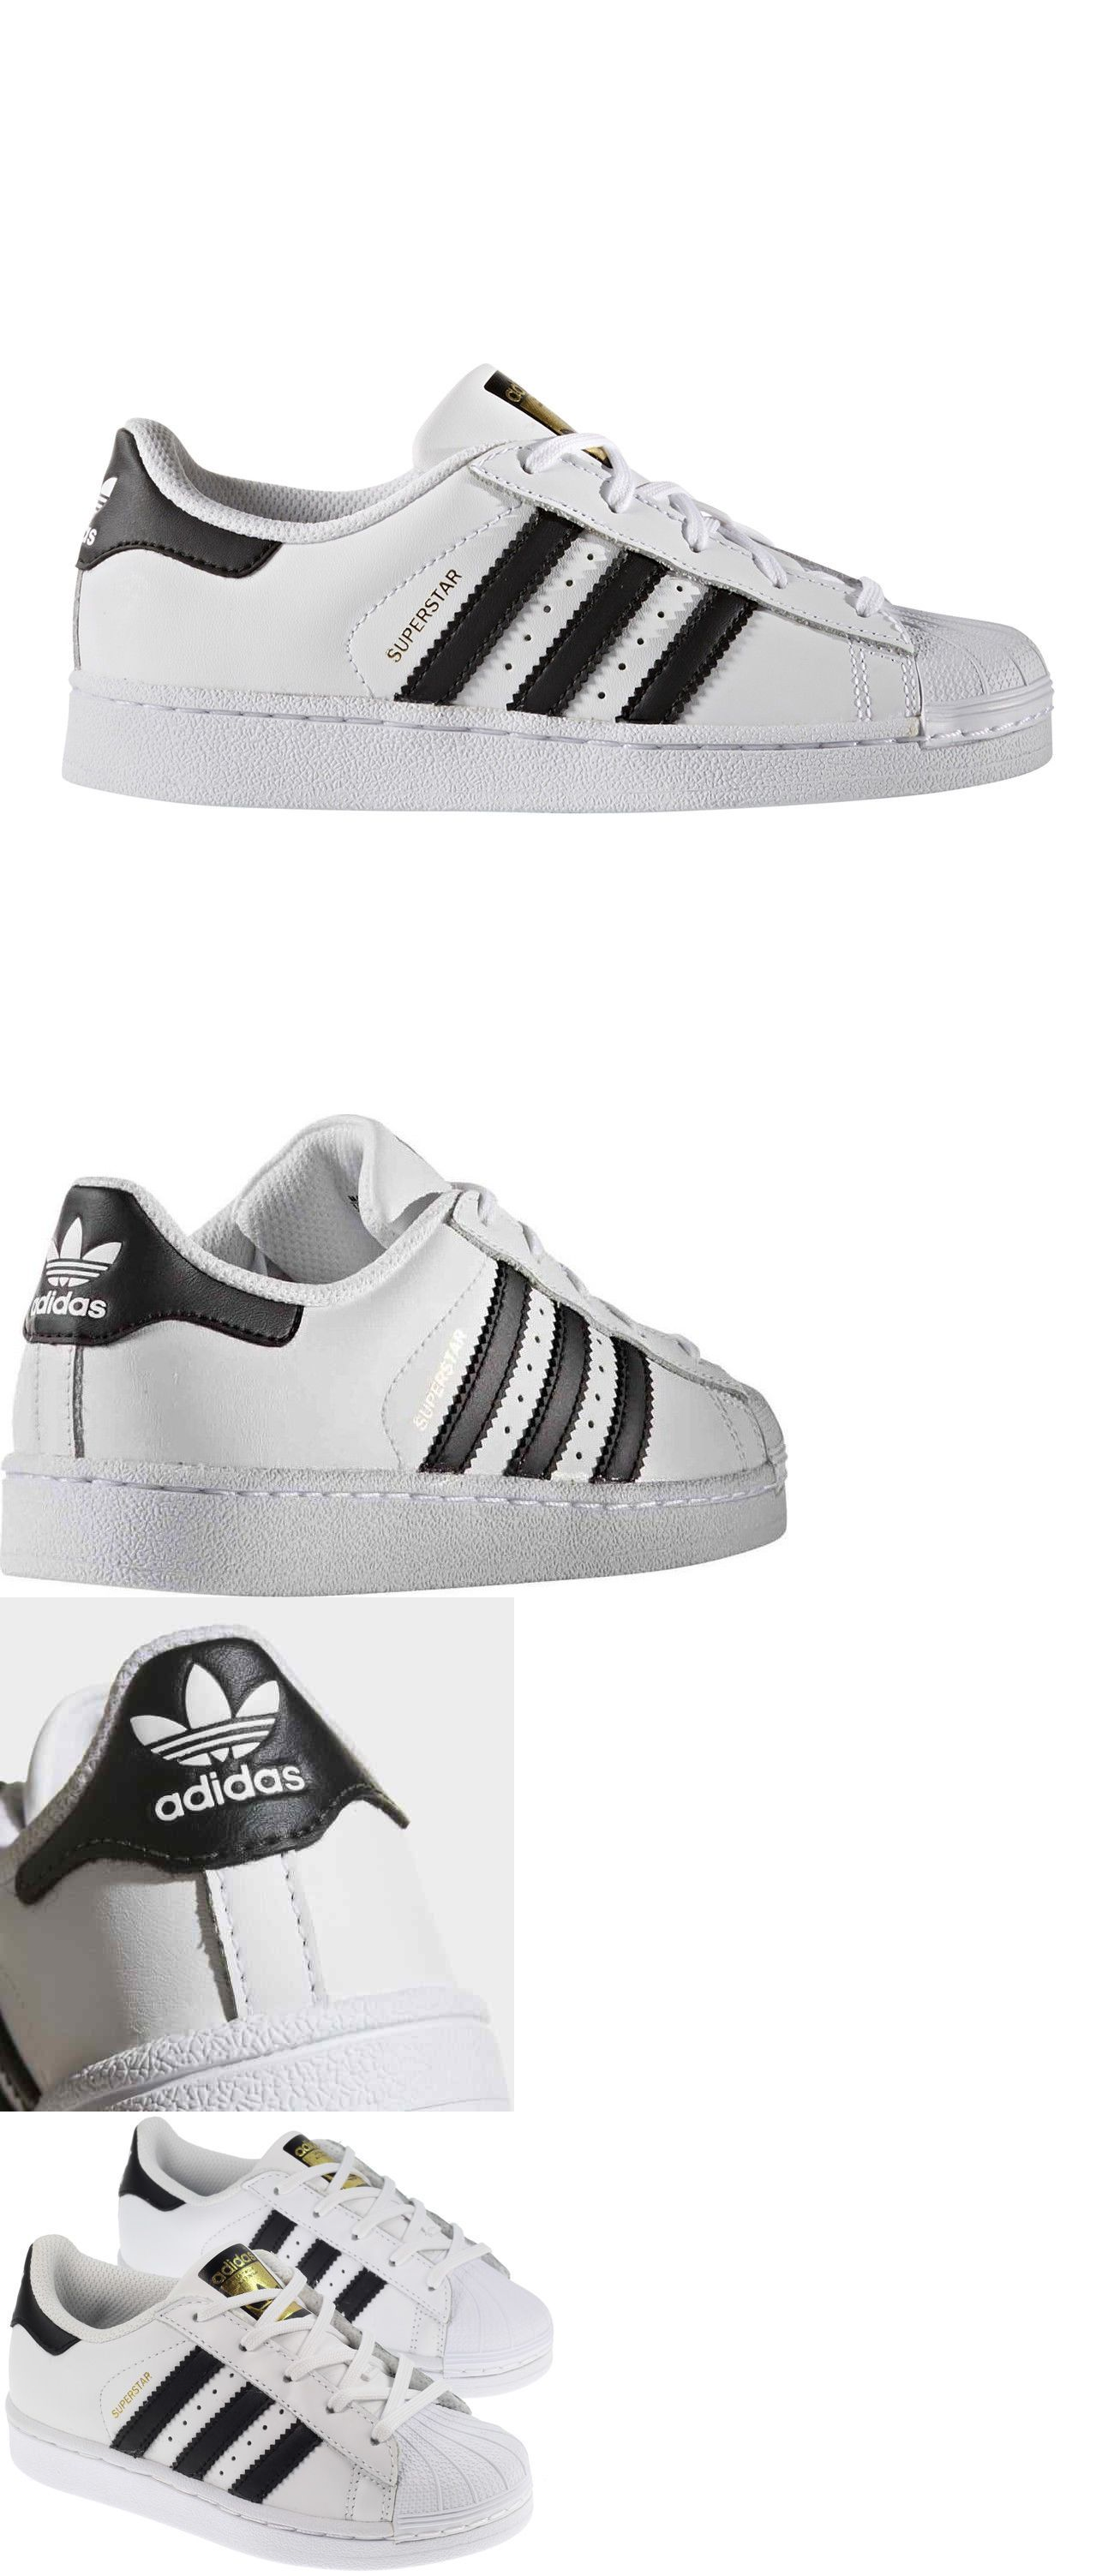 dca637e104b Boys Shoes 57929  Adidas Superstar Black White Ba8378 Leather Preschool  Kids Shoes -  BUY IT NOW ONLY   49.95 on  eBay  shoes  adidas  superstar   black ...